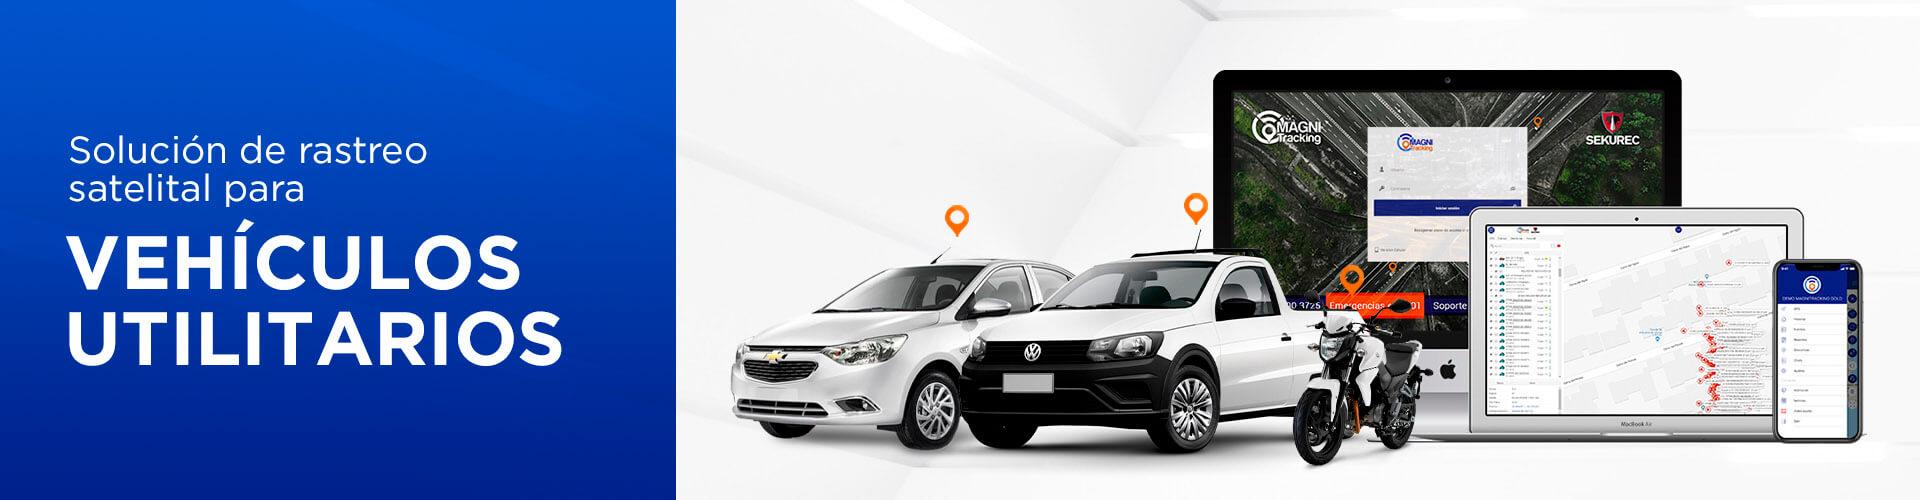 industrias-vehiculos-utilitarios